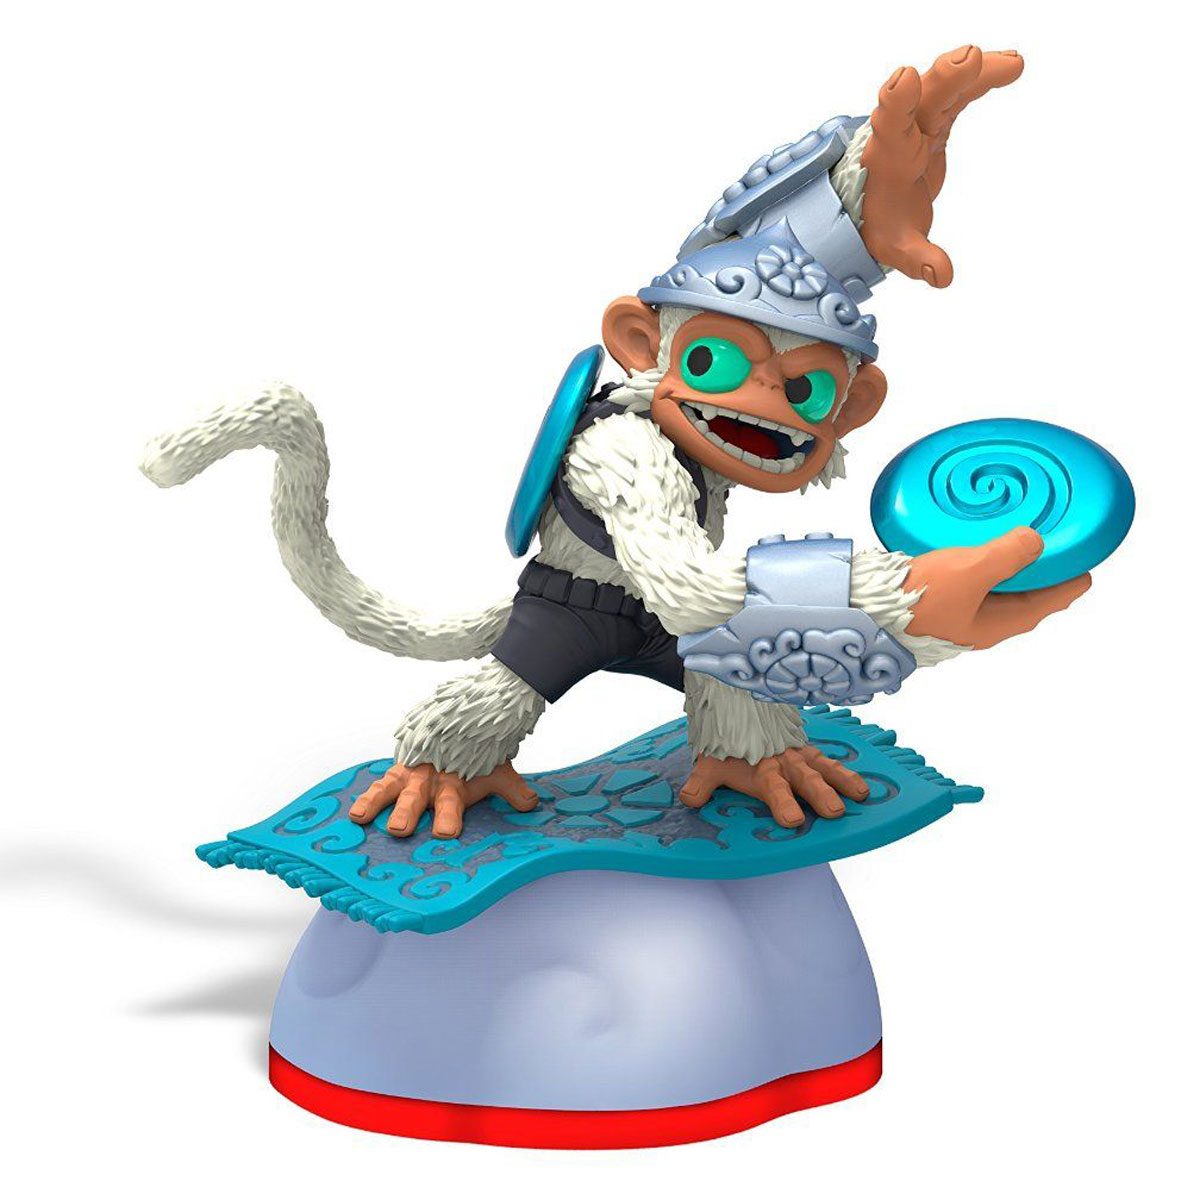 Skylanders Trap Team. Интерактивная фигурка Fling Kong, Toys For Bob